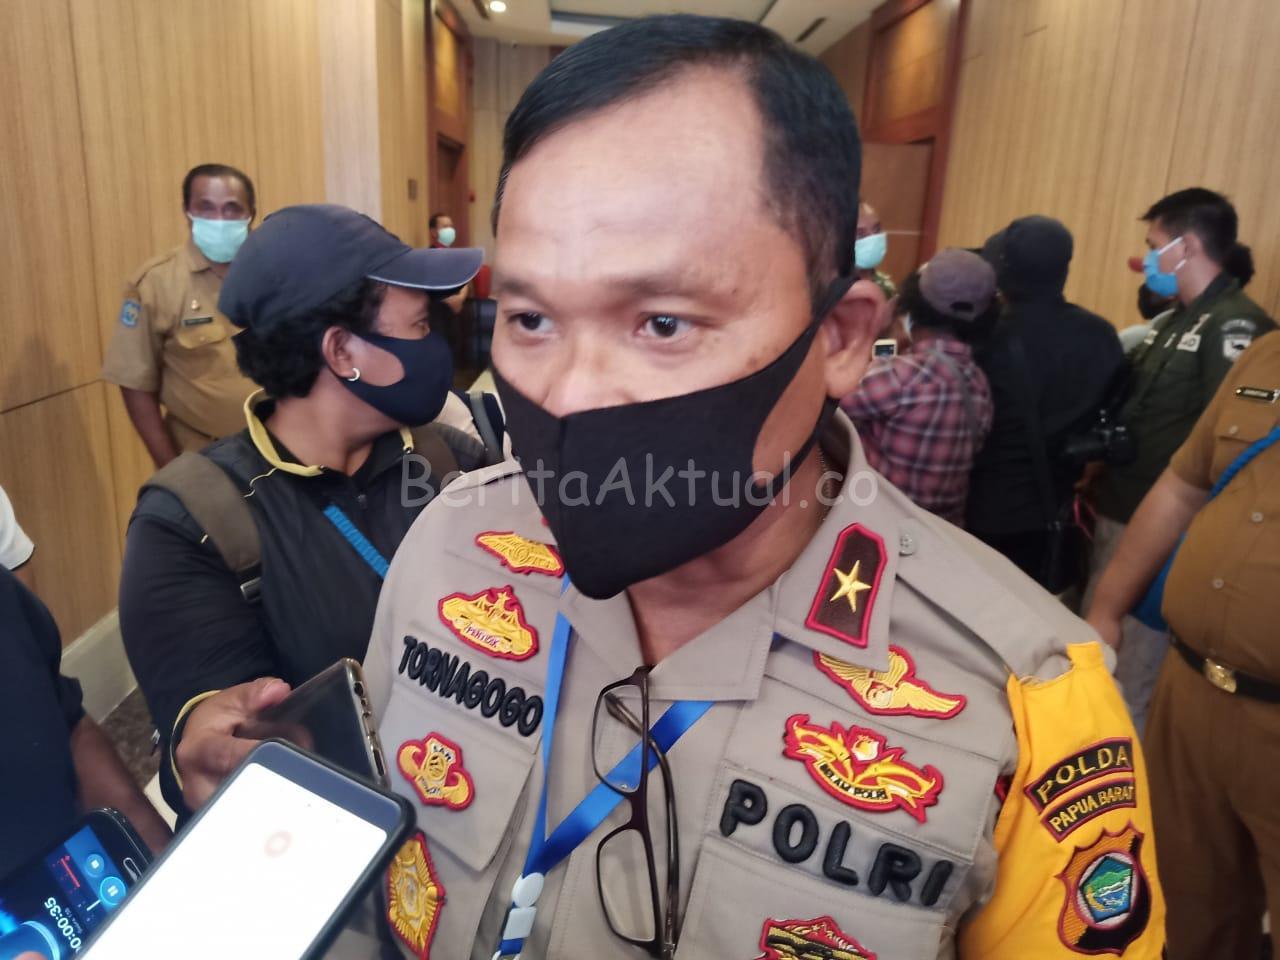 Polda Papua Barat Naik Tipe A, Akan Dipimpin Jenderal Bintang Dua 25 IMG 20200420 WA0055